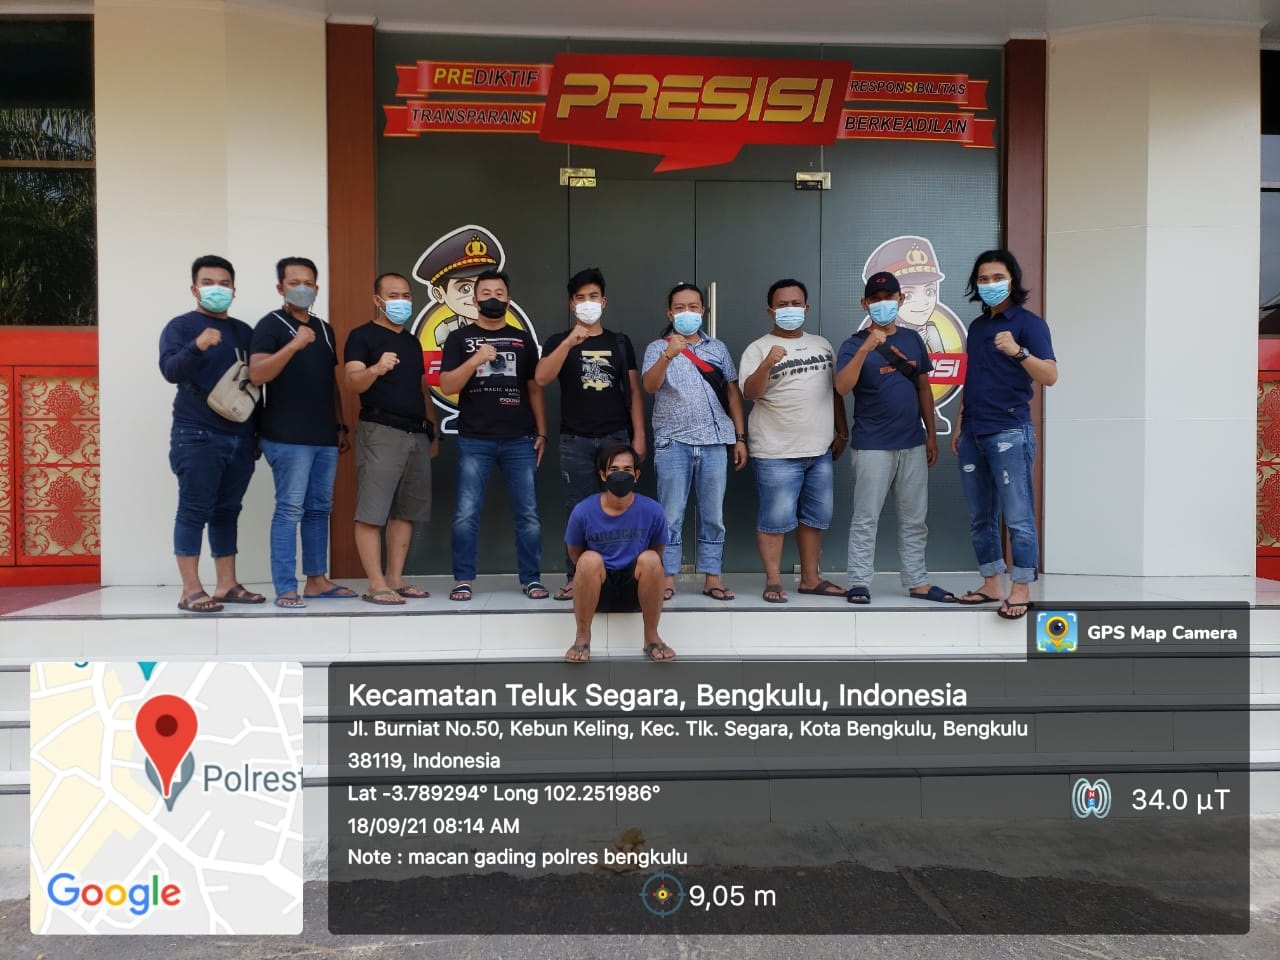 Tempo 5 Jam, Tersangka Penusukan Ditangkap Polres Bengkulu